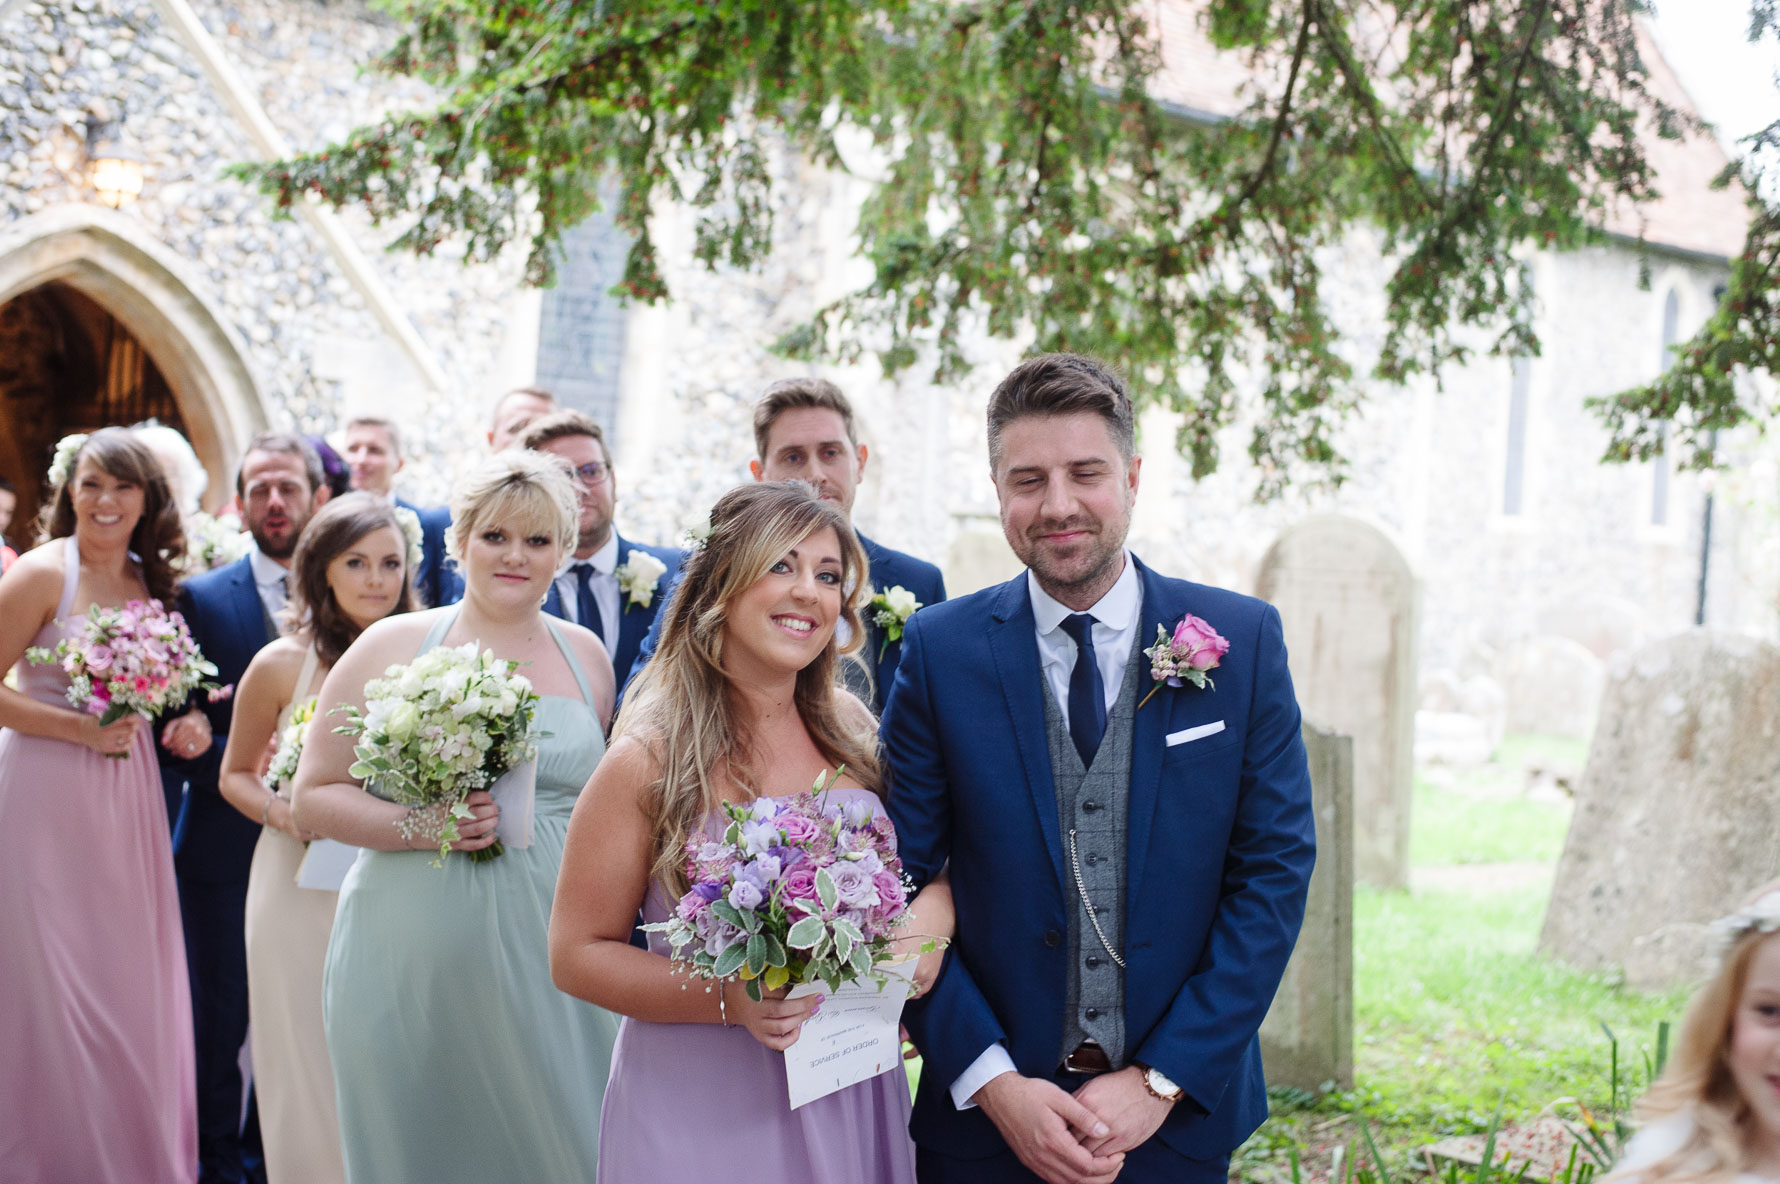 Canterbury Cathedral Lodge Wedding38-20141004 0642